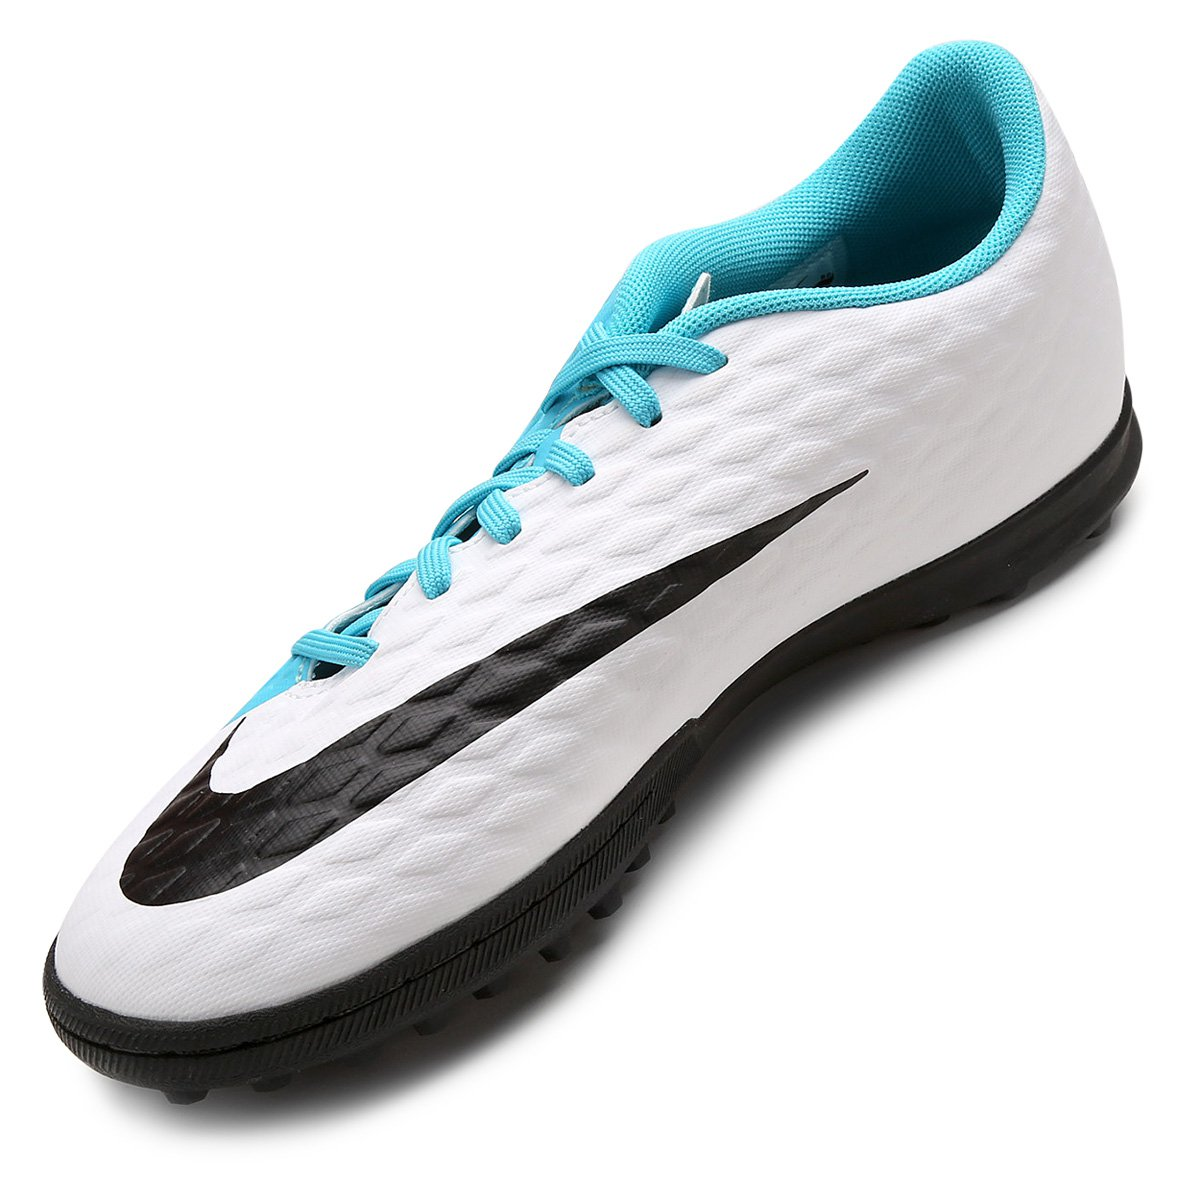 Chuteira Society Nike Hypervenom Phade 3 - Branco e Azul - Compre ... 95dc9f12418c1